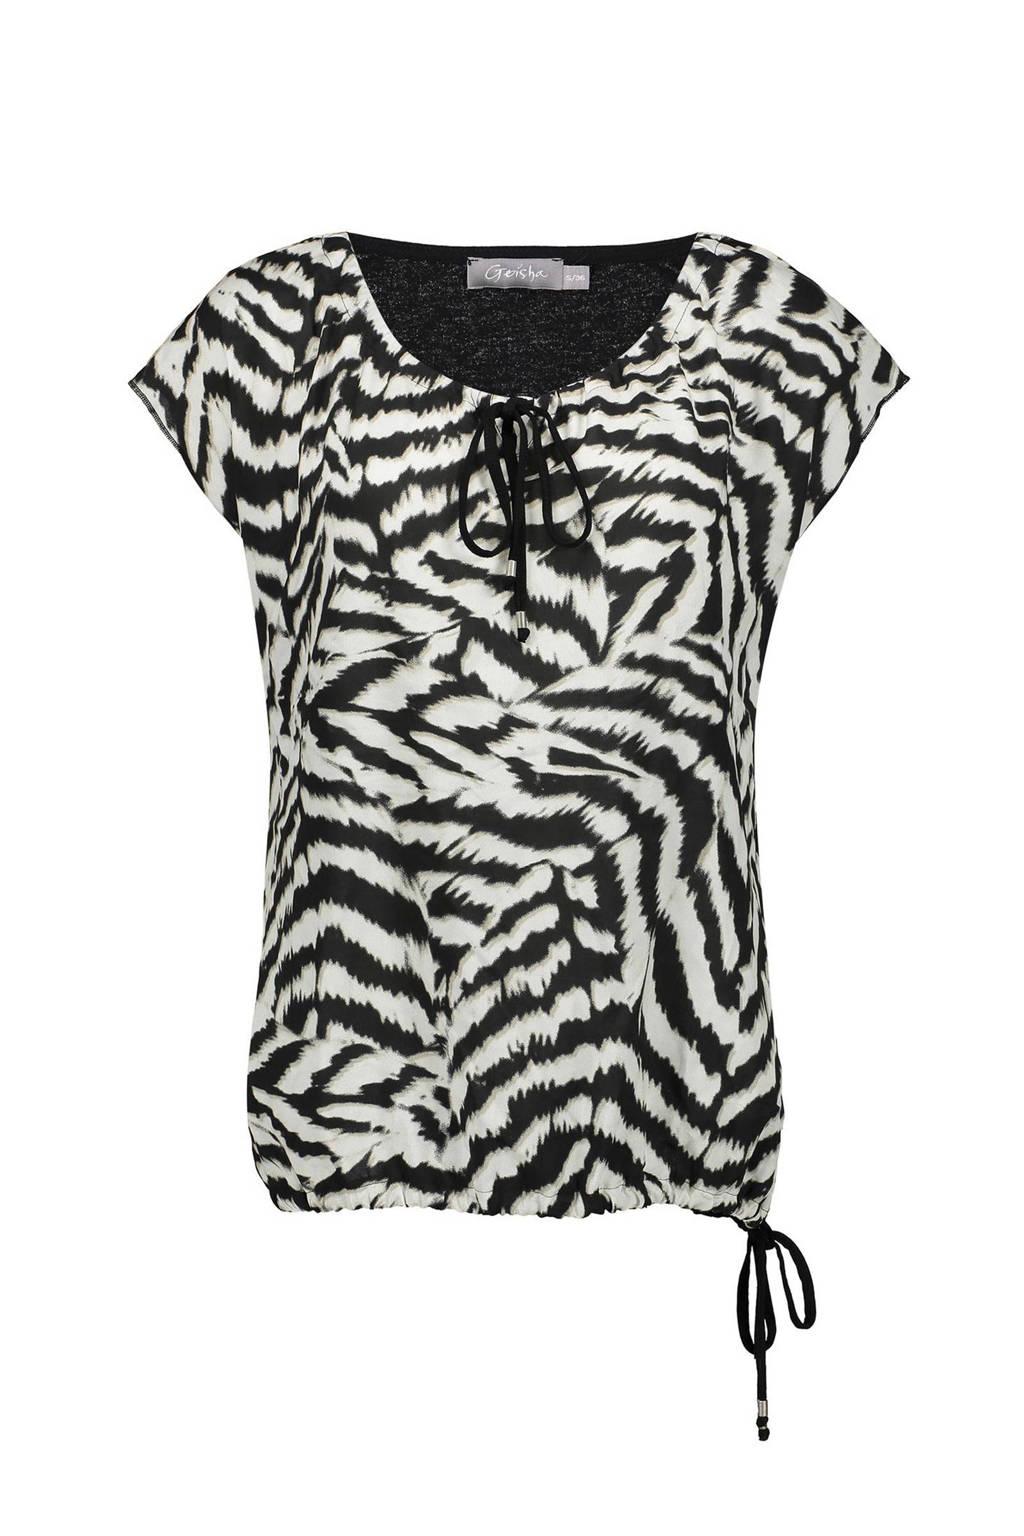 Geisha T-shirt met zebraprint zwart/wit/zand, Zwart/wit/zand